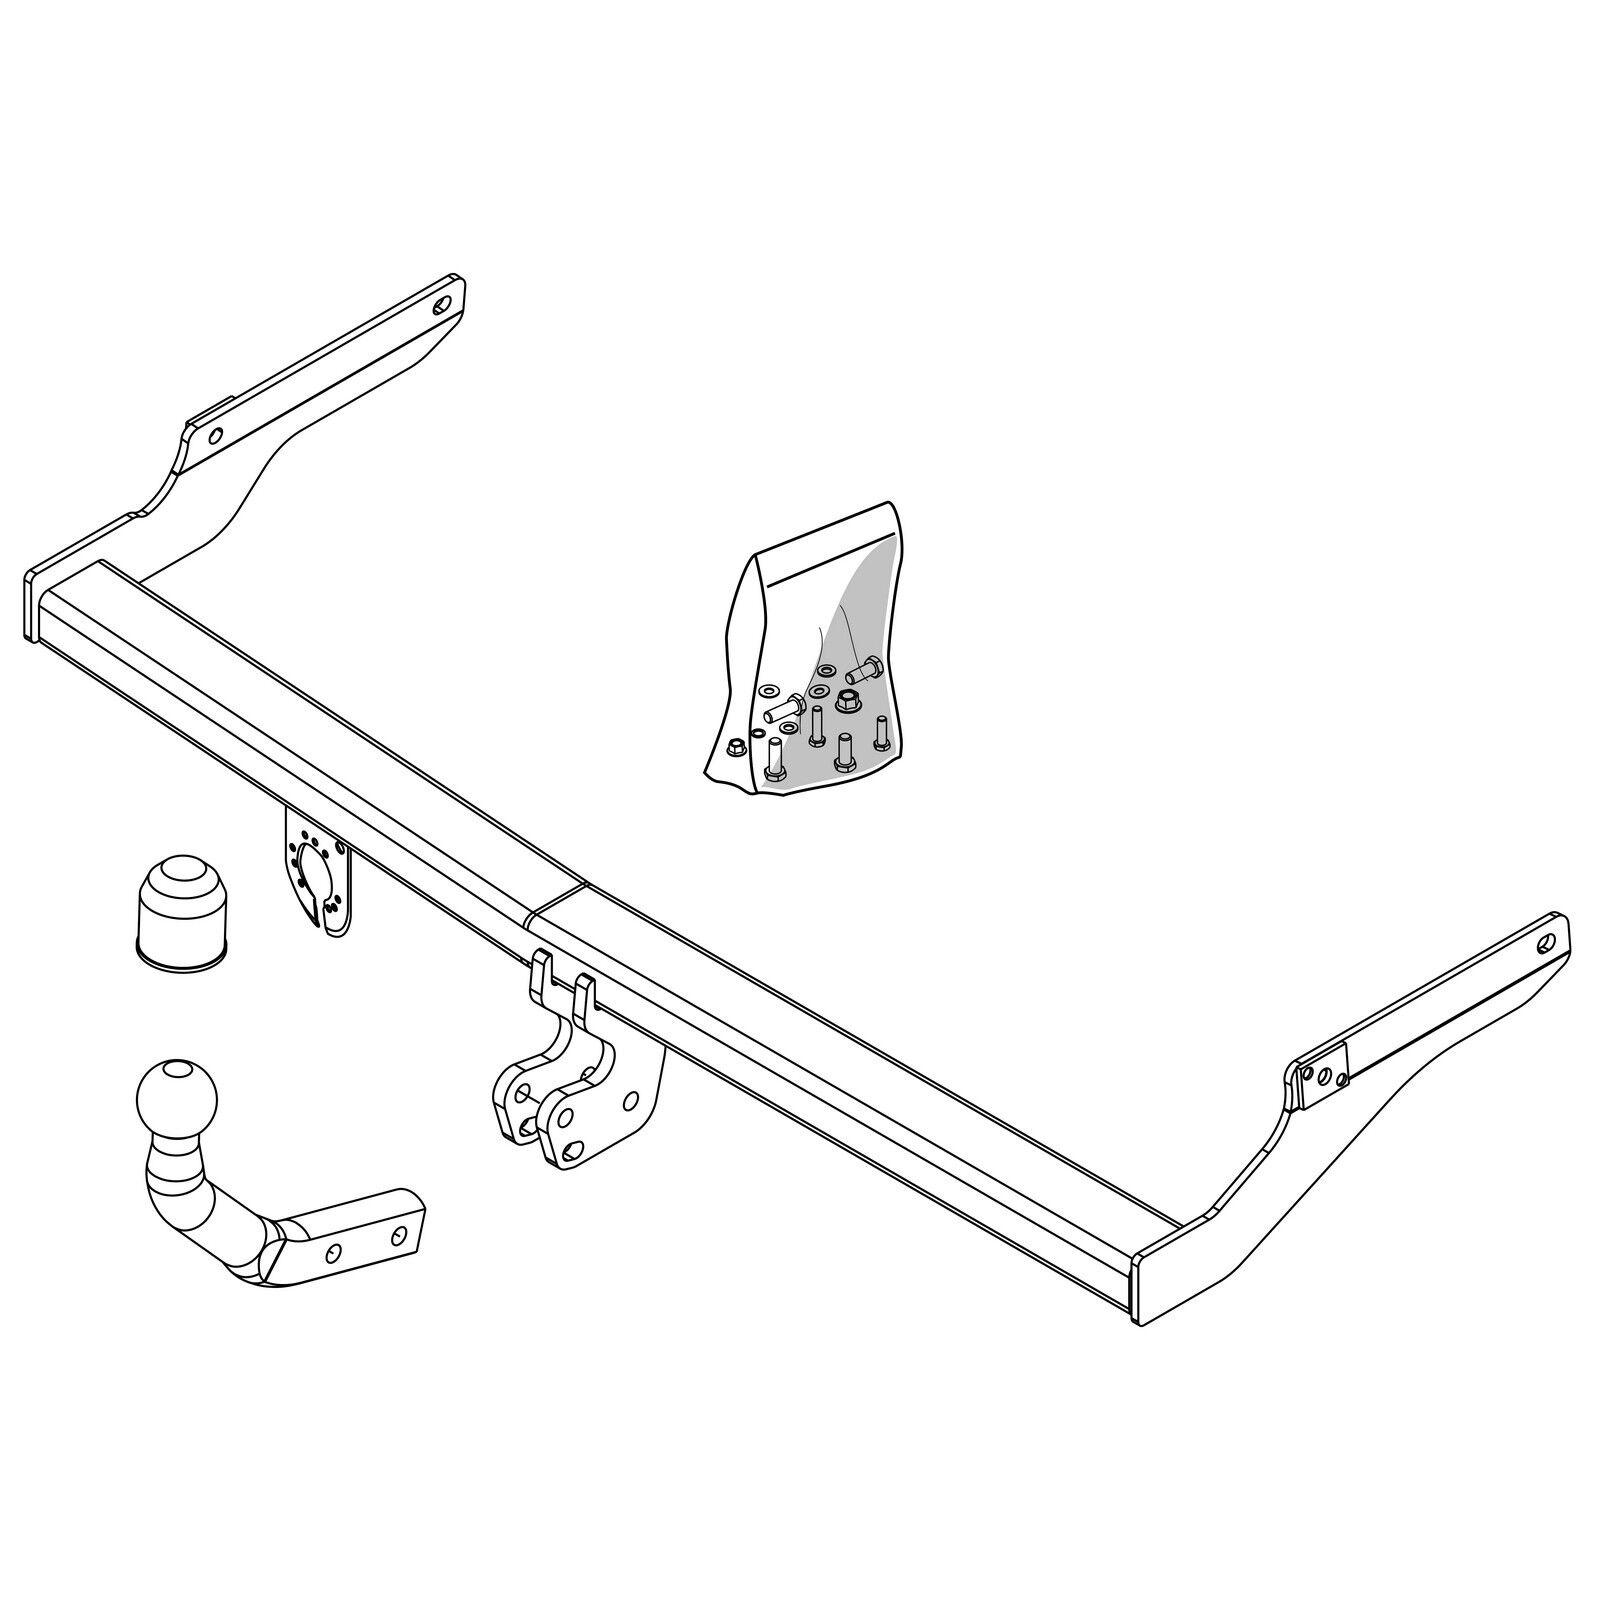 details about brink towbar for peugeot 206 hatchback 1998-2008 - swan neck tow  bar